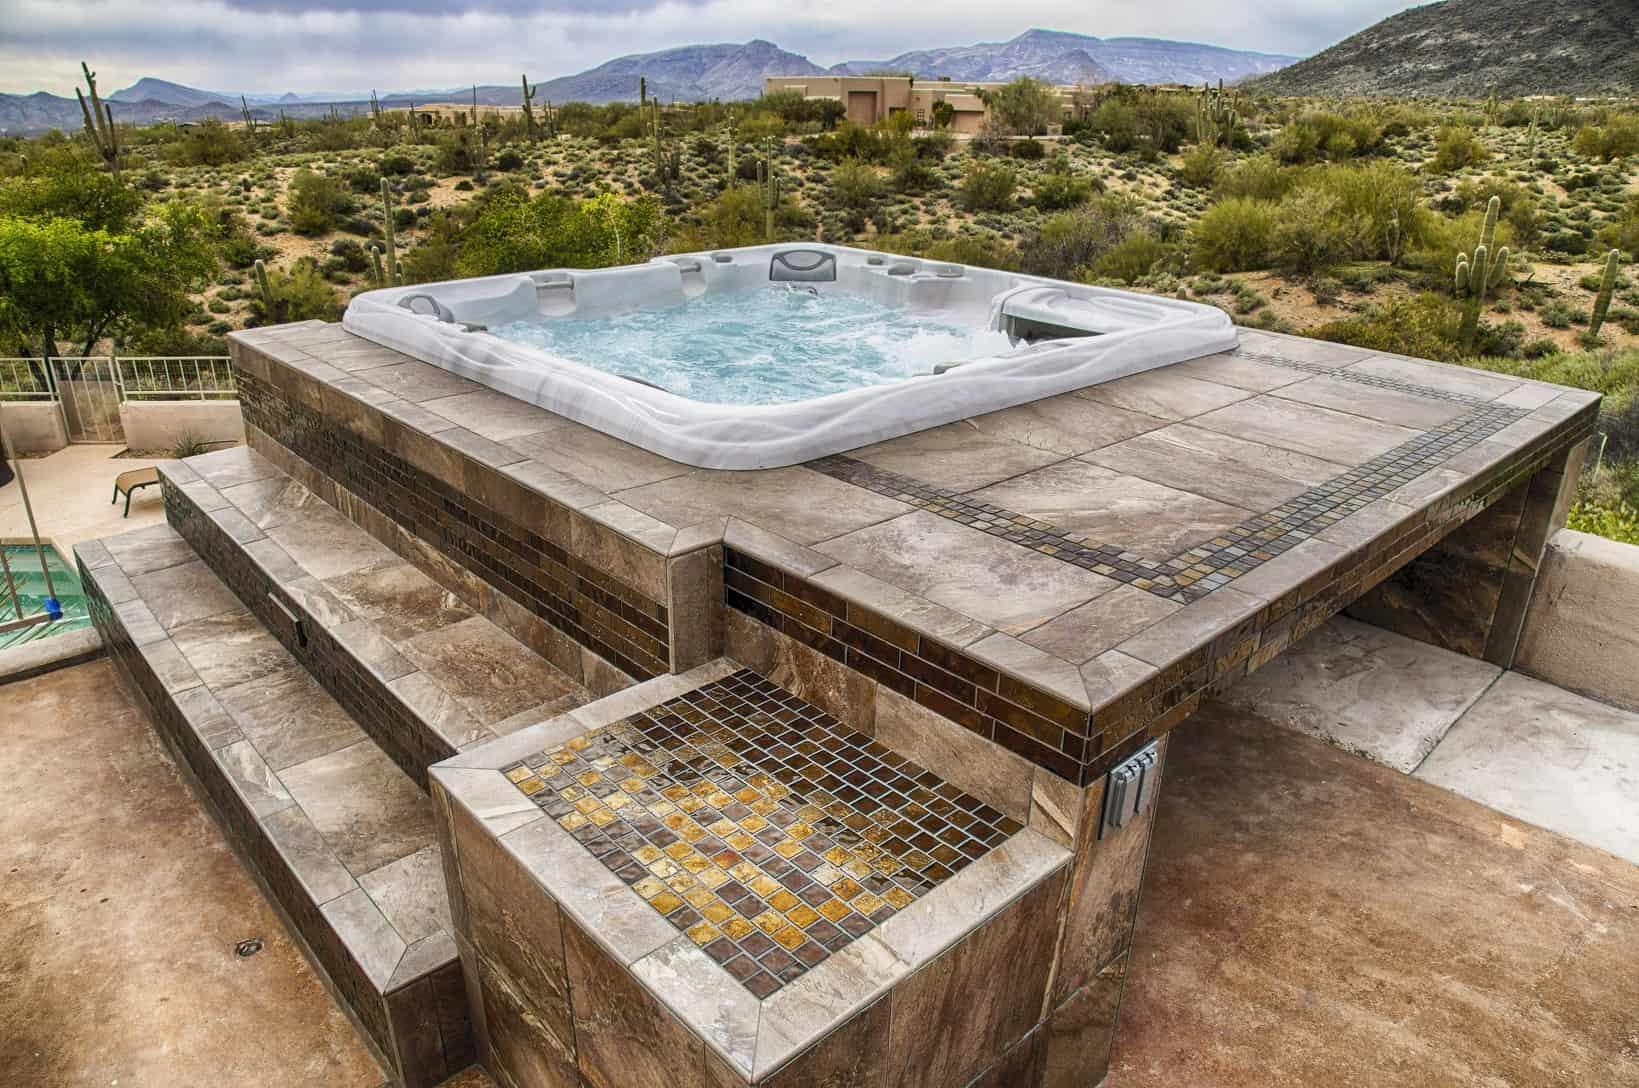 imagine-backyard-living-hot-tub-spa-jacuzzi-sundance-10